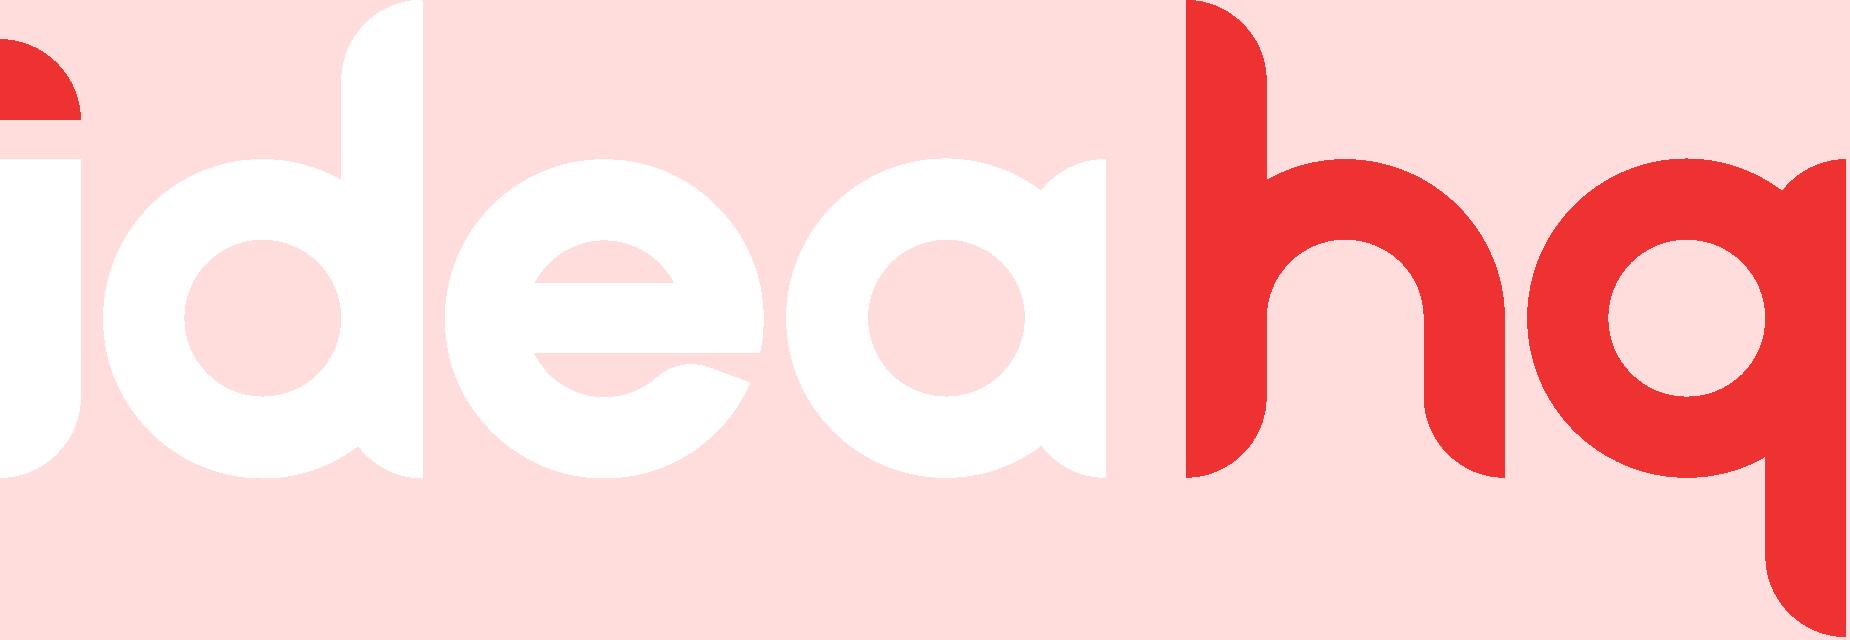 Logo de nos clients qui témoignent